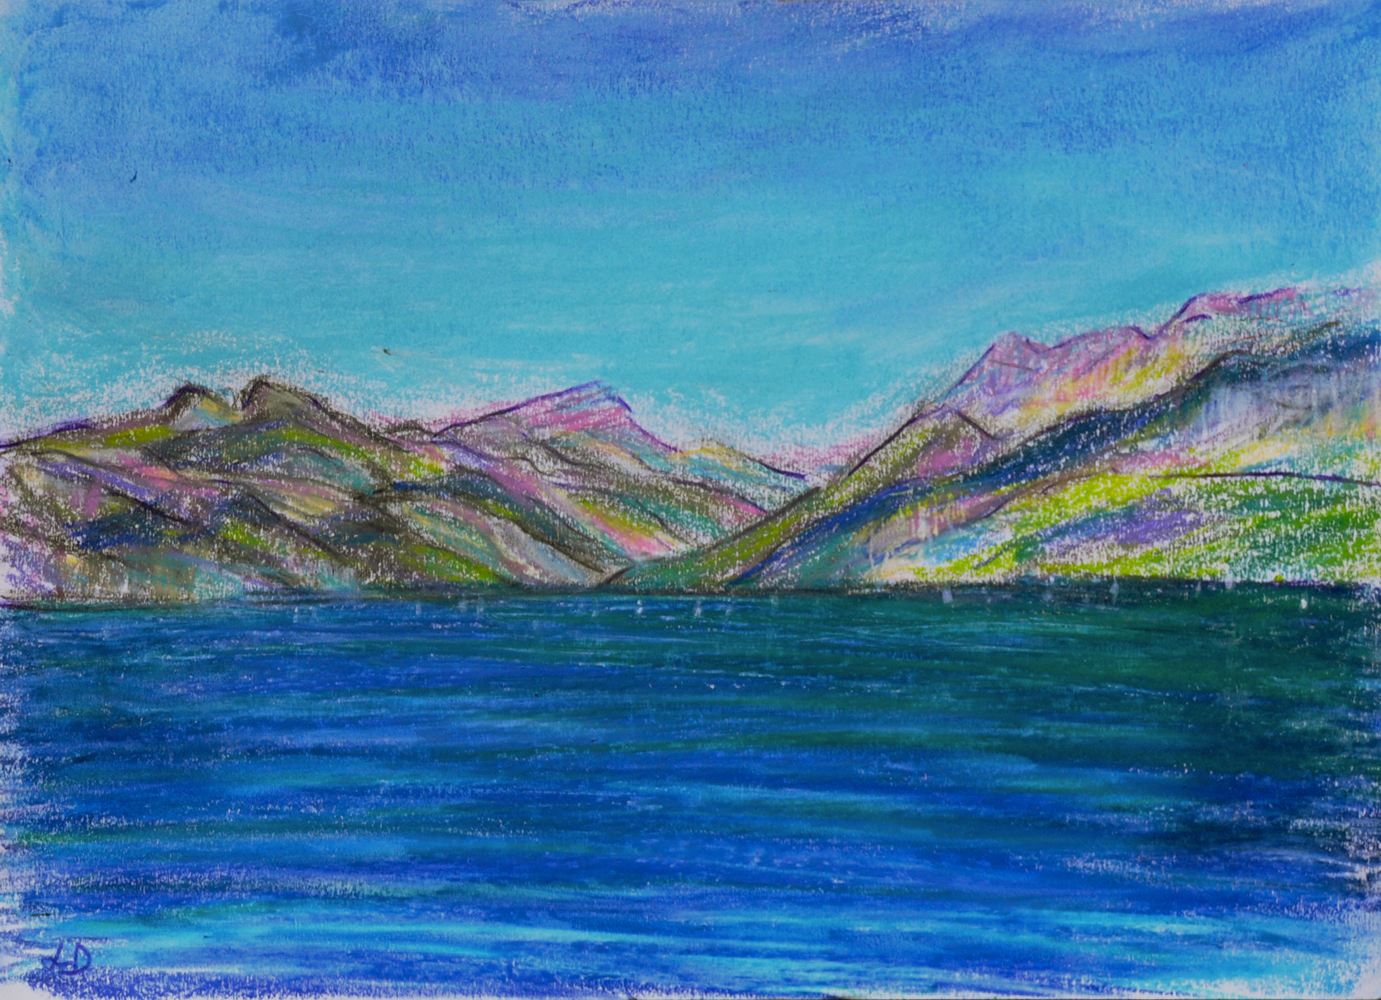 Lake Geneva, St Prex no. 3. Mixed media on paper, 21x30, 2018